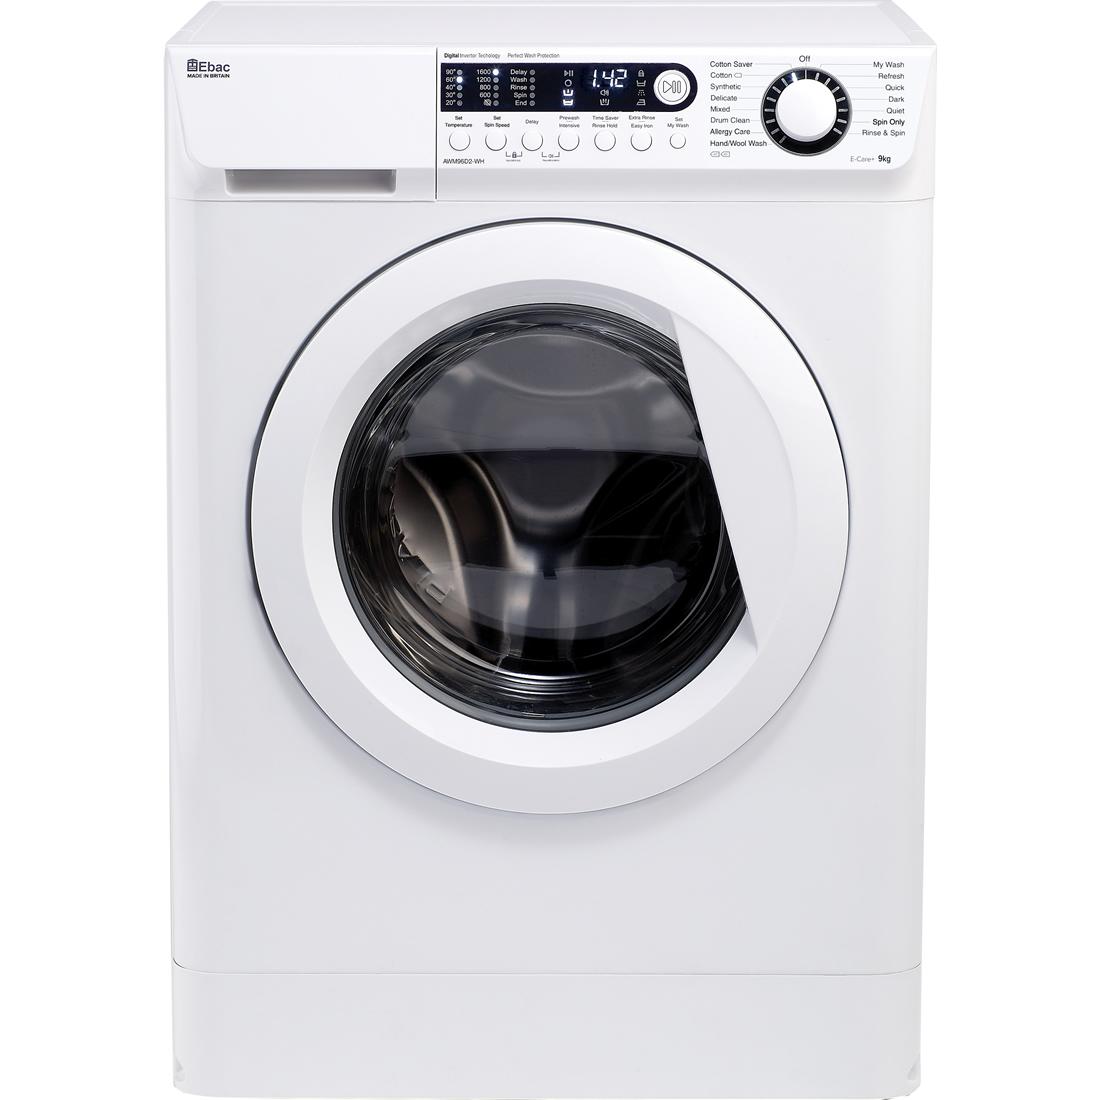 1600rpm Washing Machine 9kg Load Class A+++